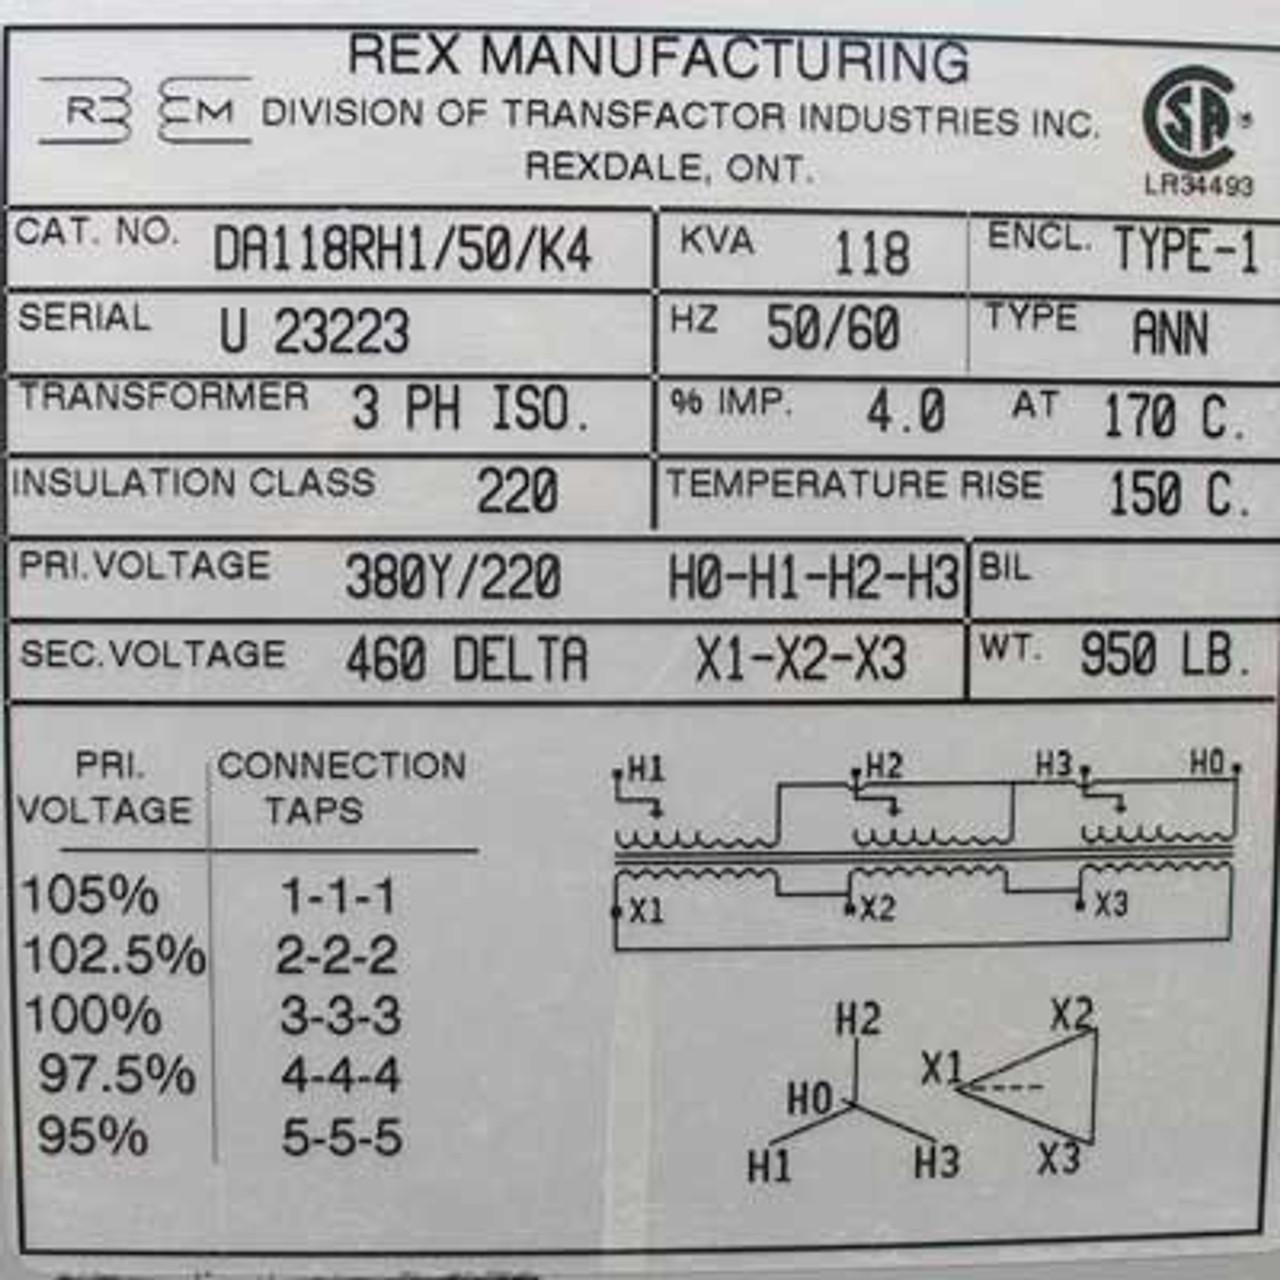 Rex Mfg DA118RH1/50/K4 118 KVA 380Y/220 to 460 Volts 3 PH Transformer - New